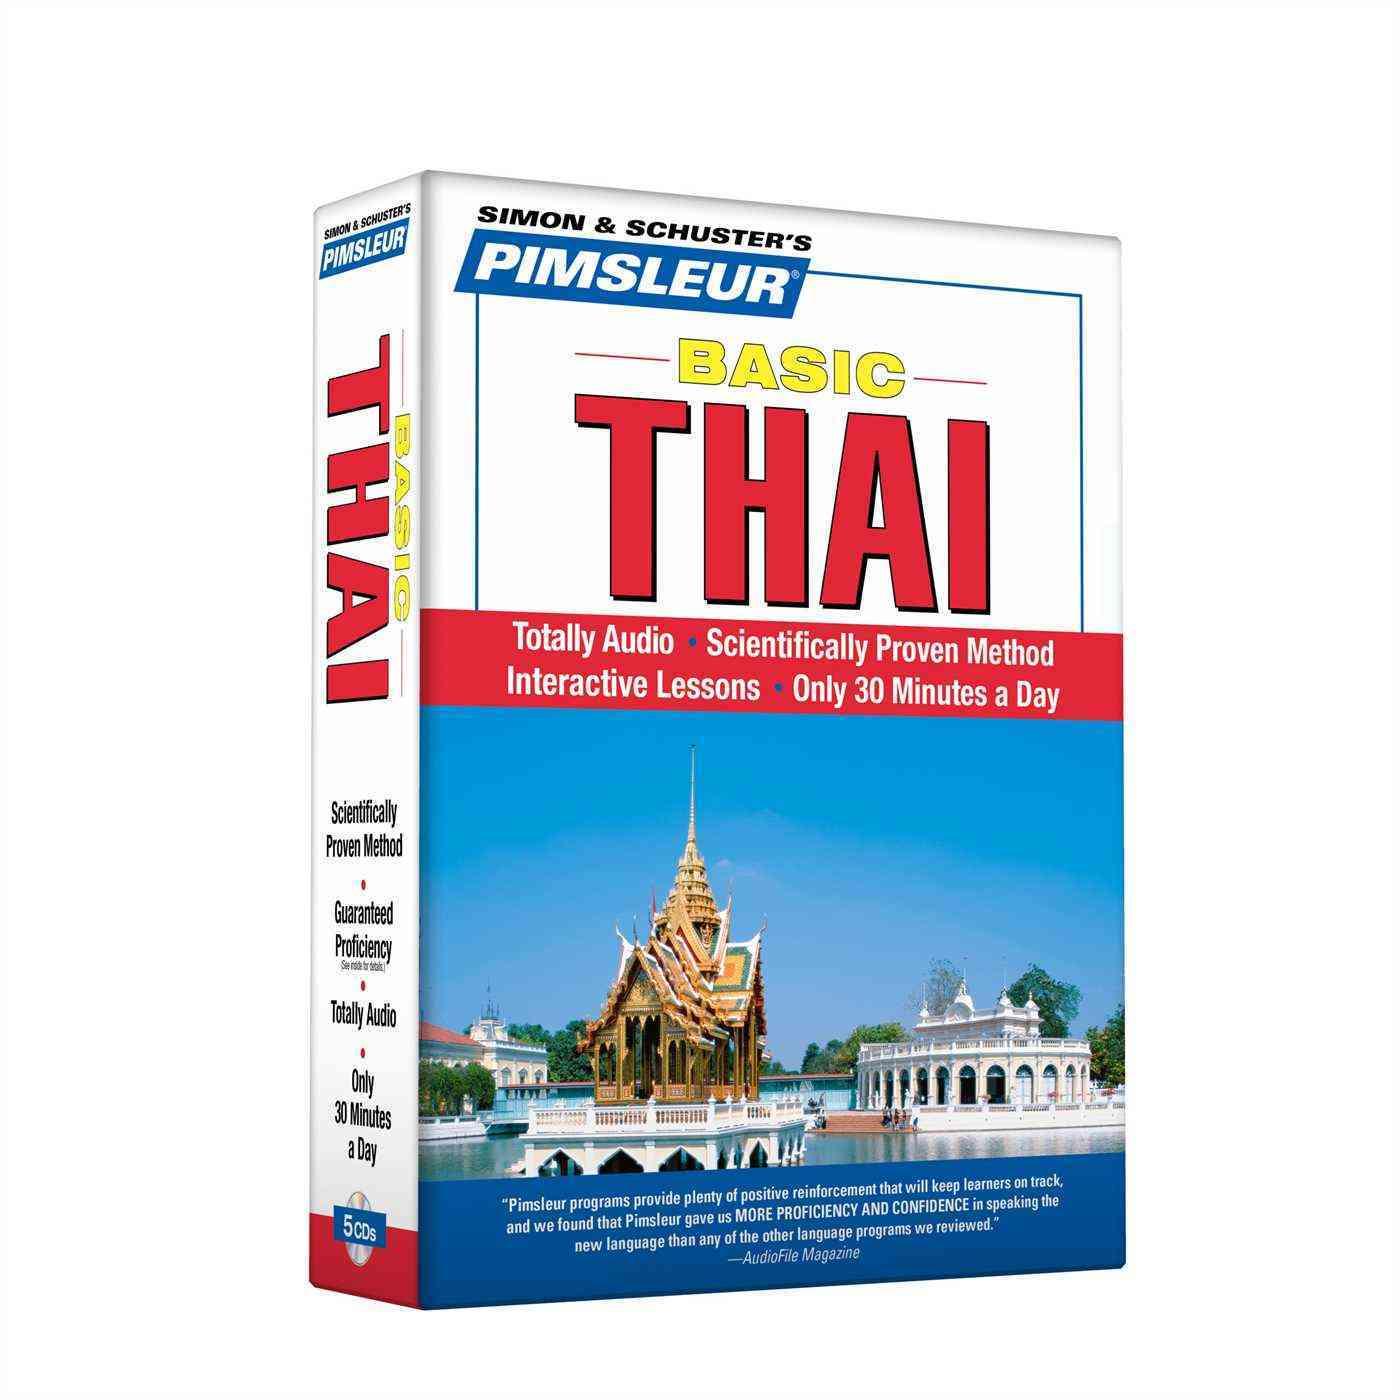 [CD] Pimsleur Basic Thai